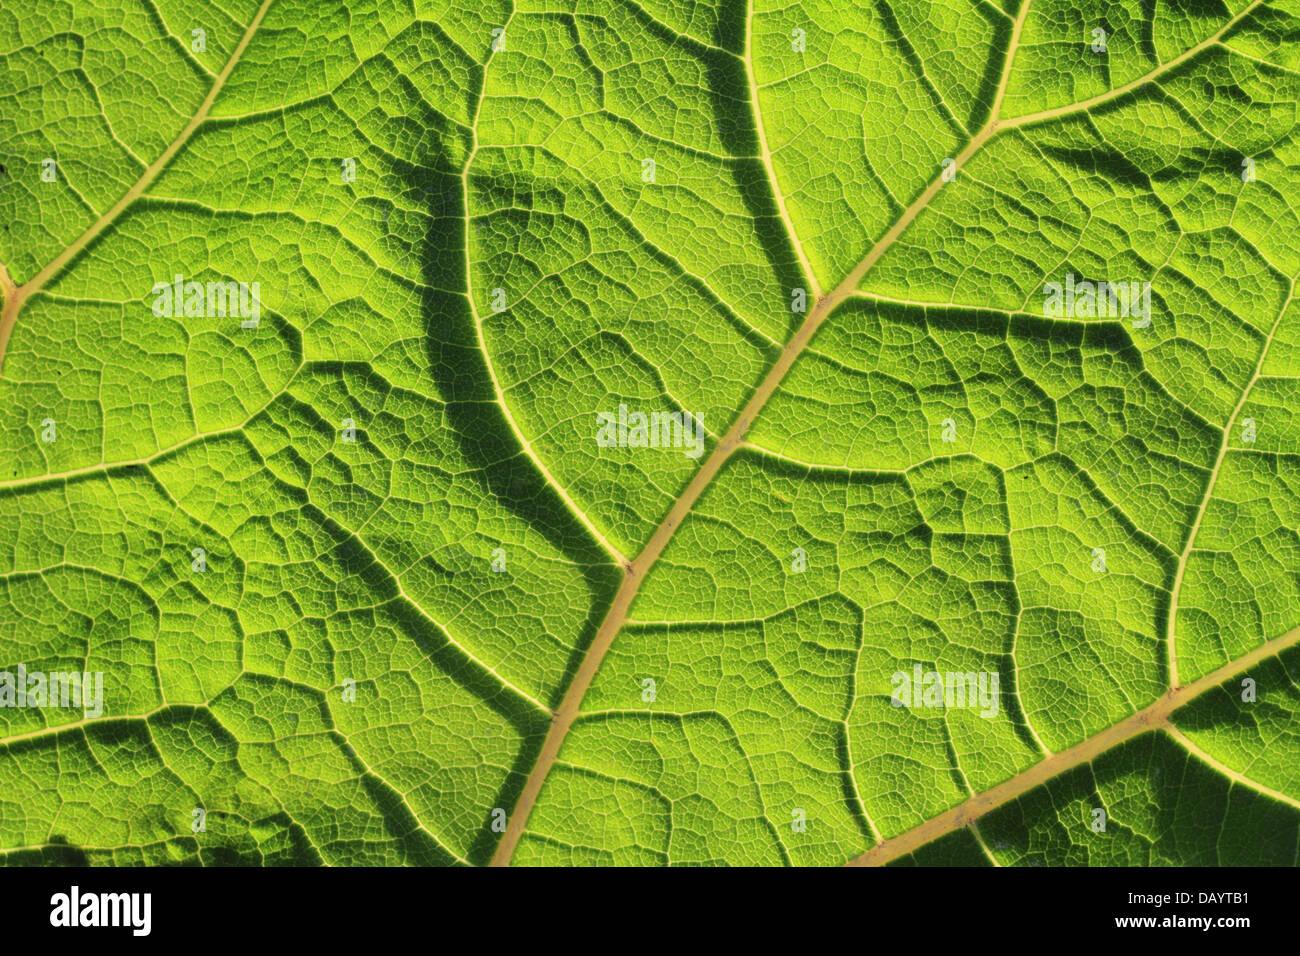 A back- and sidelit leaf of Common Butterbur (Petasites hybridus) close-up. Photographed at Kvak Mølle, Denmark. - Stock Image